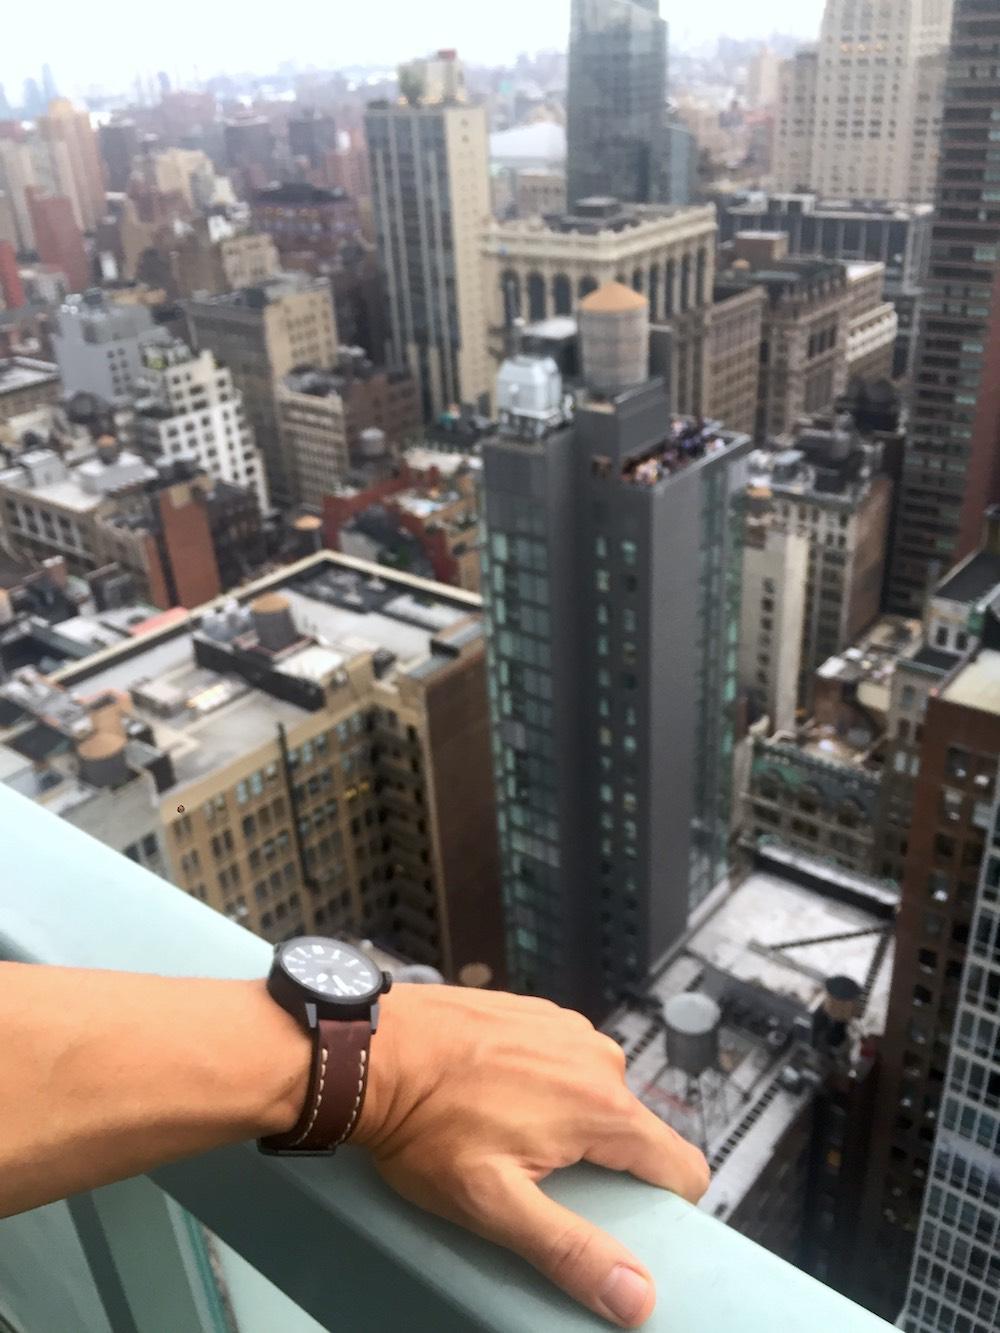 WATCH WINNER REVIEW: Tsovet SMT-FW44 Wrist Time Reviews